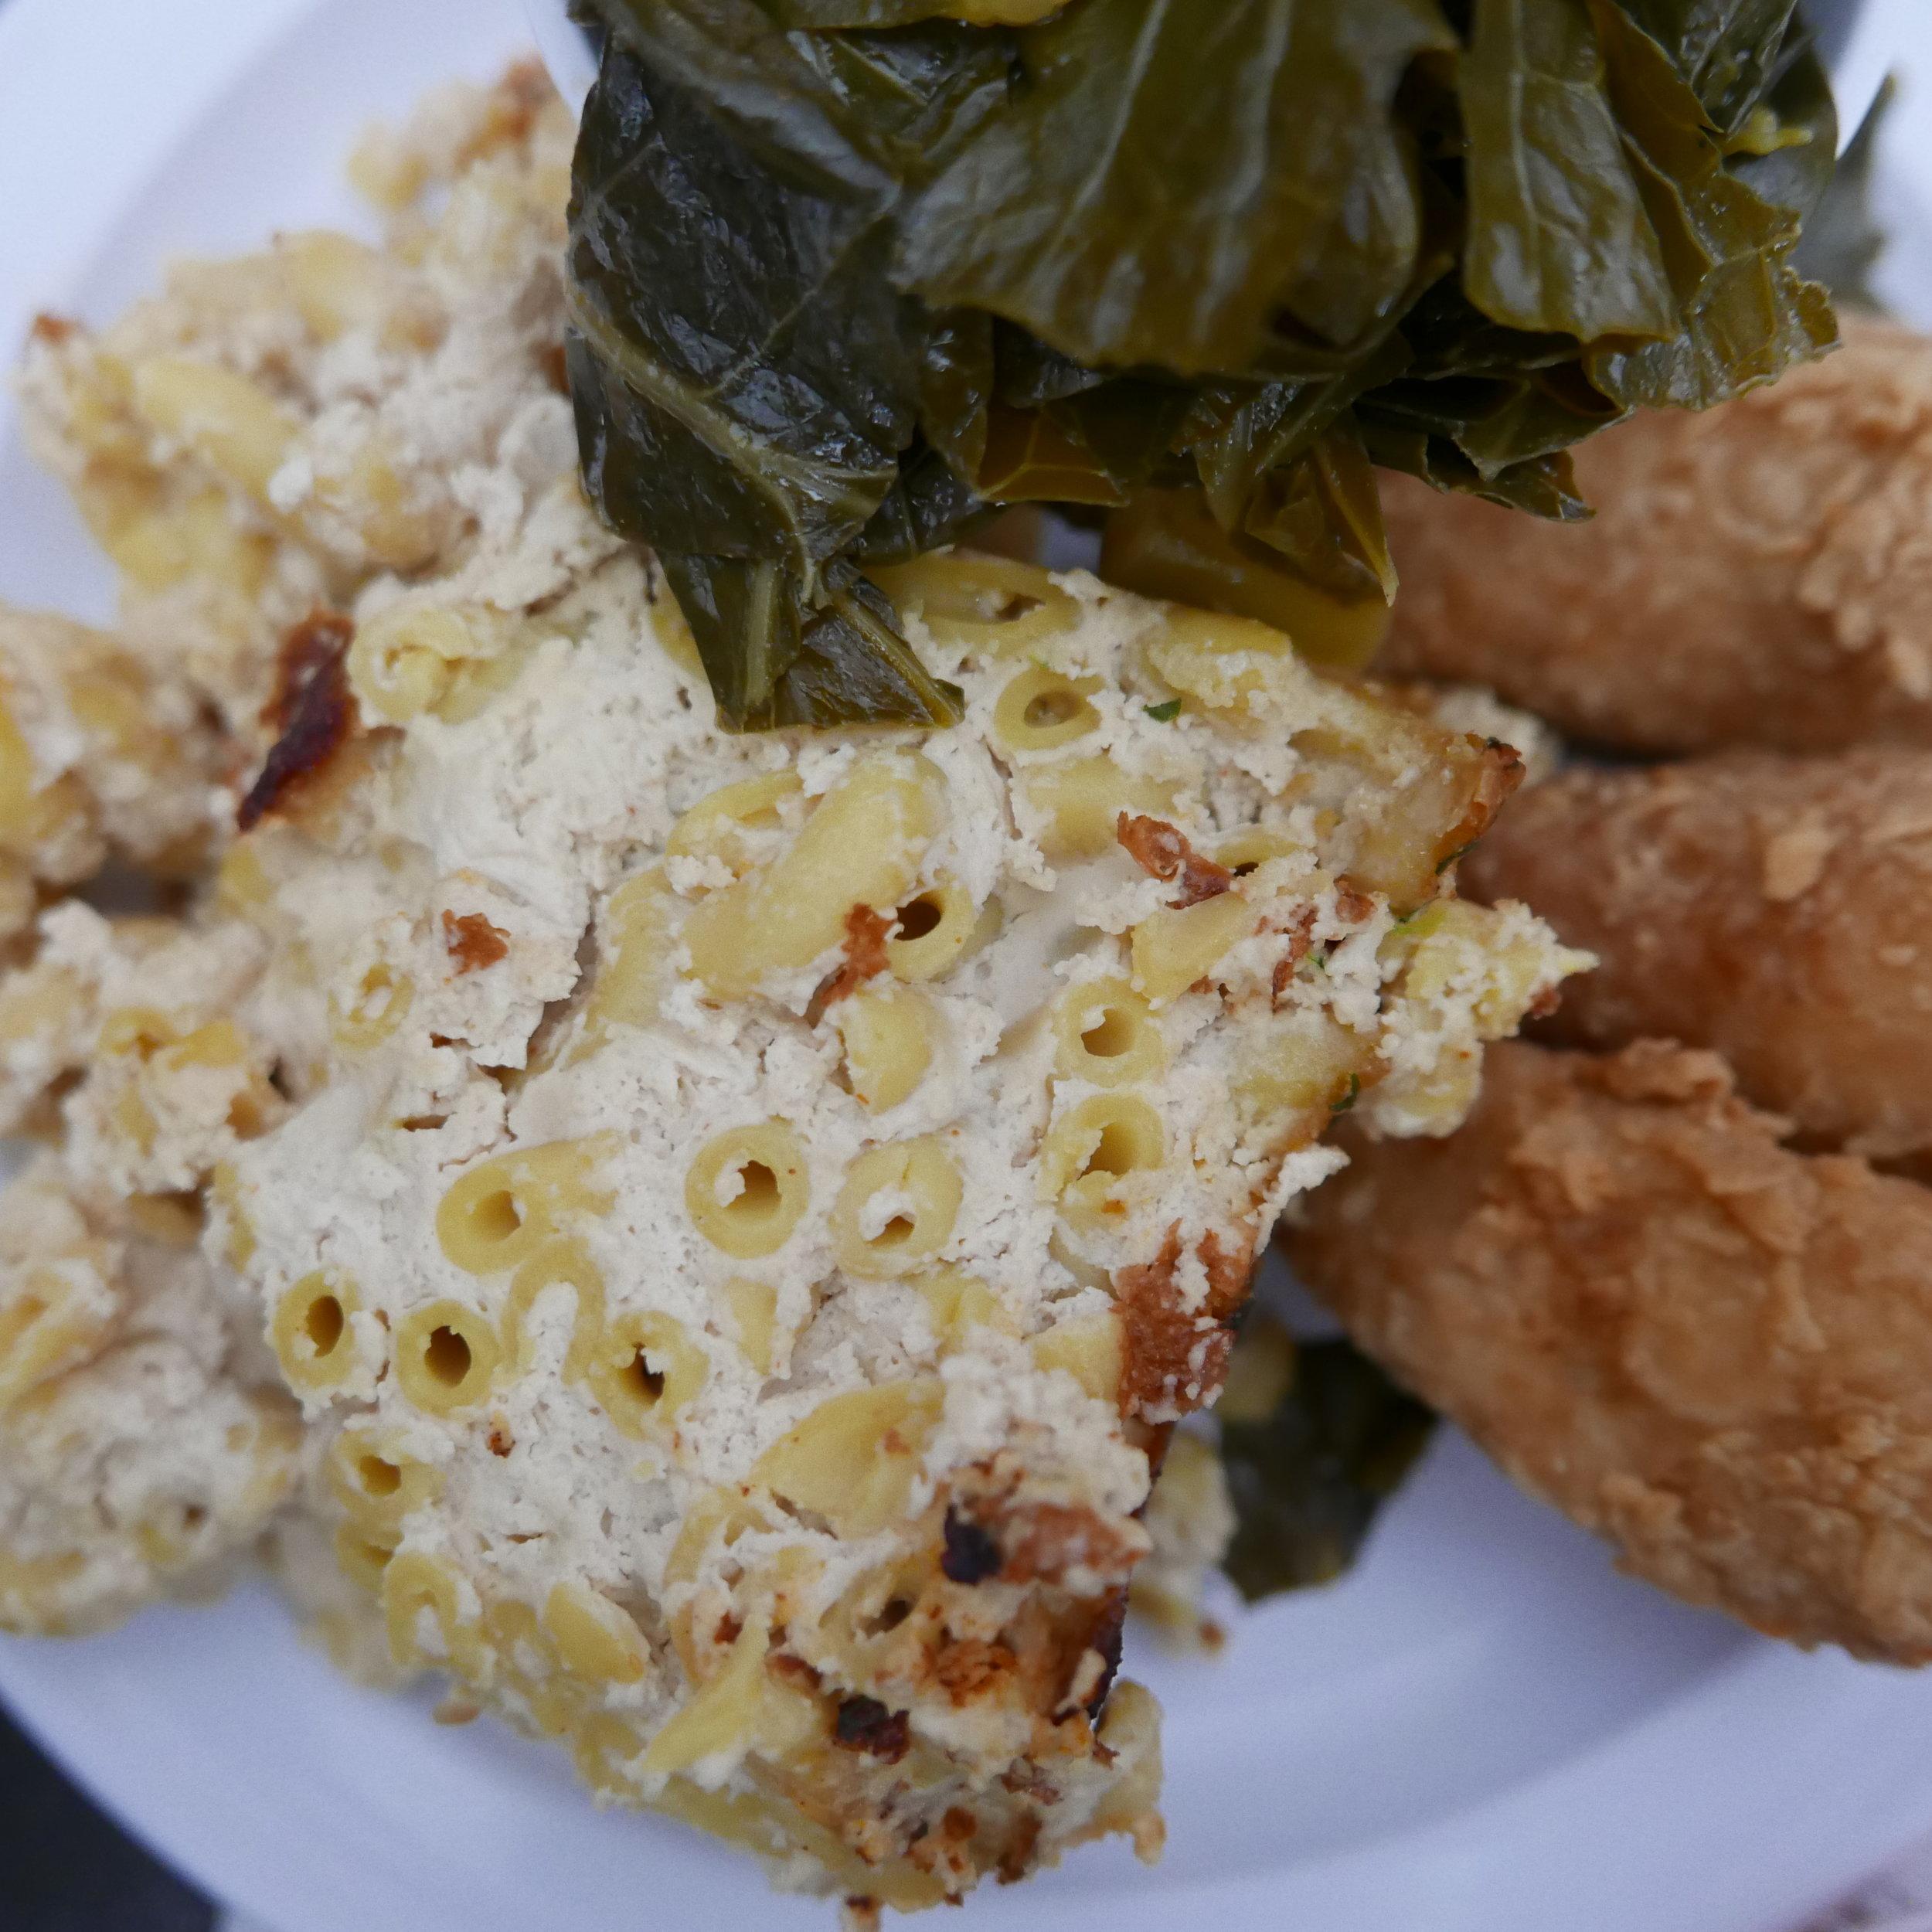 The amazing vegan mac and cheese, fried chicken, and collard greens